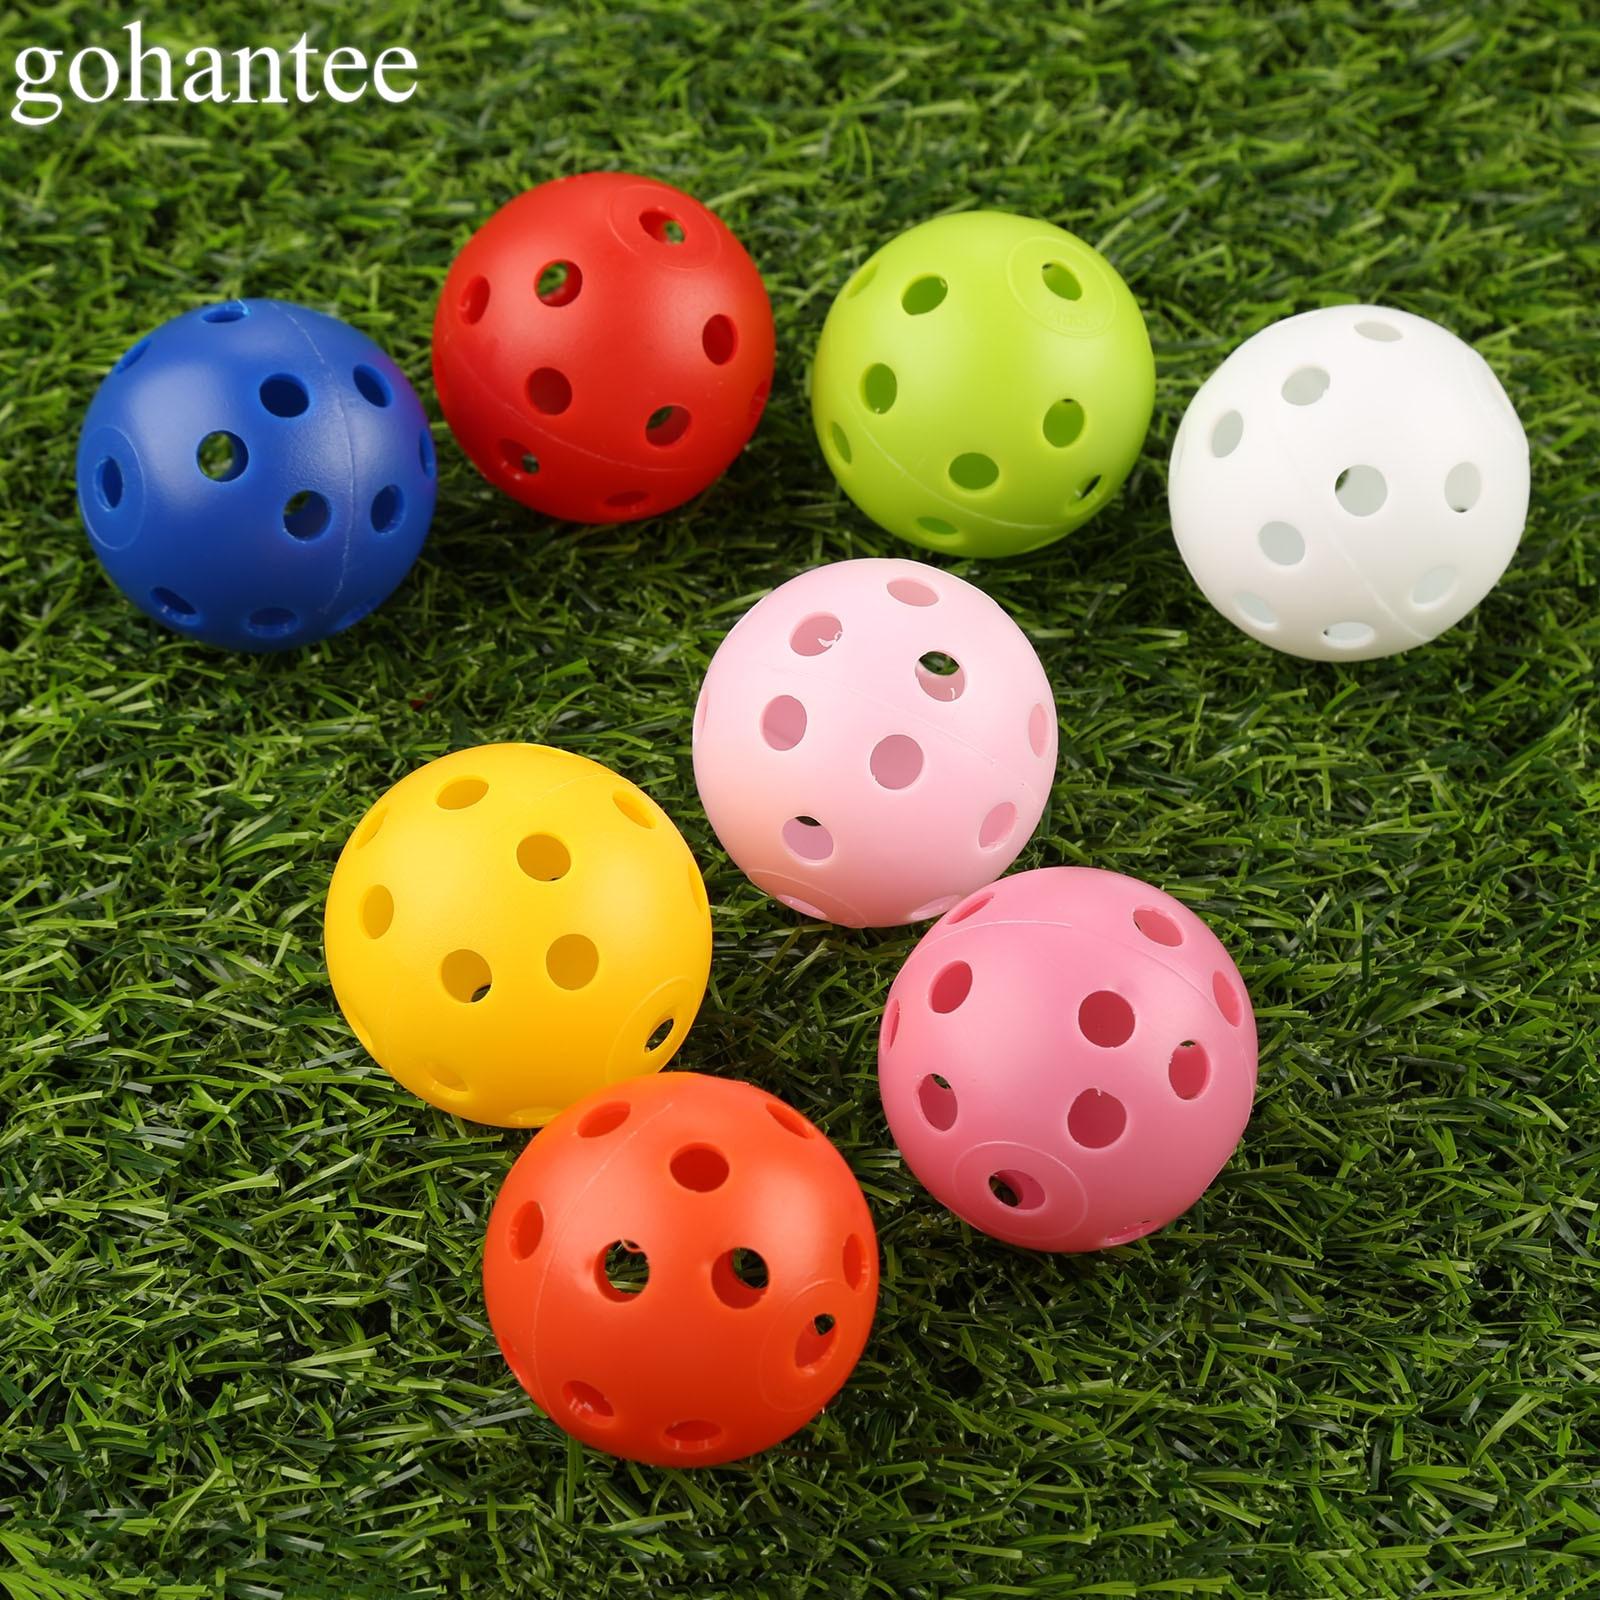 Gohantee 10Pcs 41mm Golf Training Balls Plastic Airflow Hollow With Hole Golf Balls Outdoor Golf Practice Balls Golf Accessories